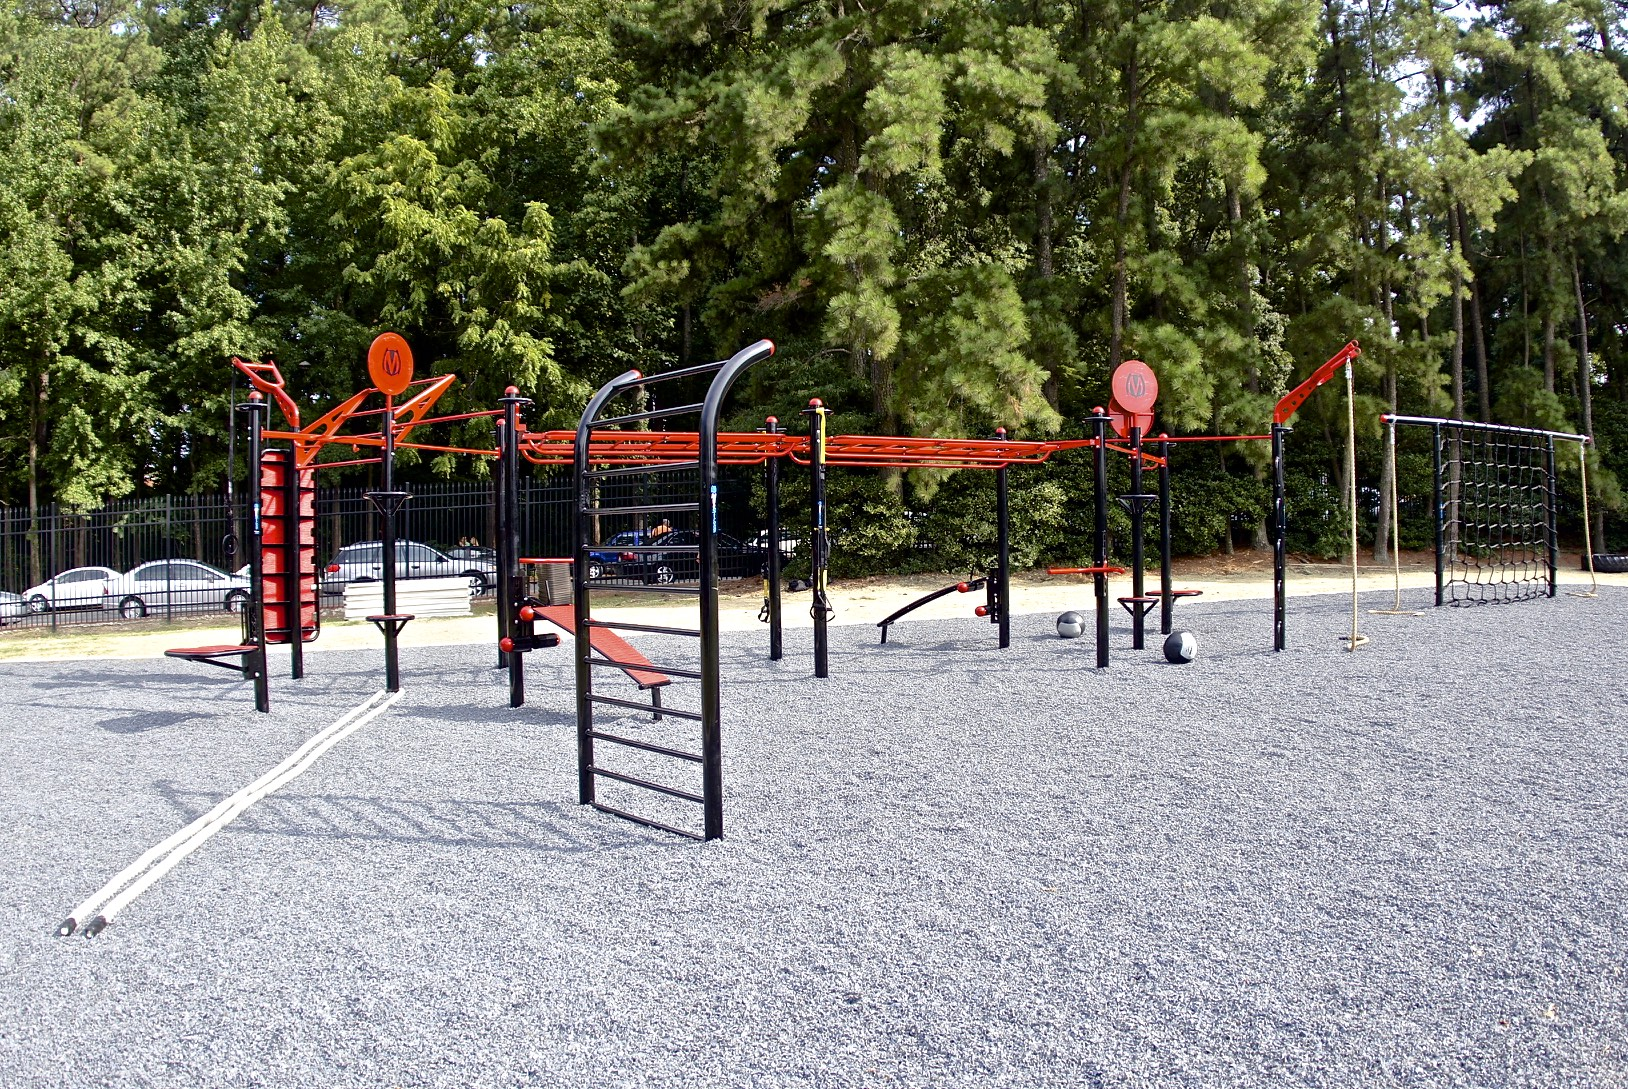 FitGround outdoor fitness